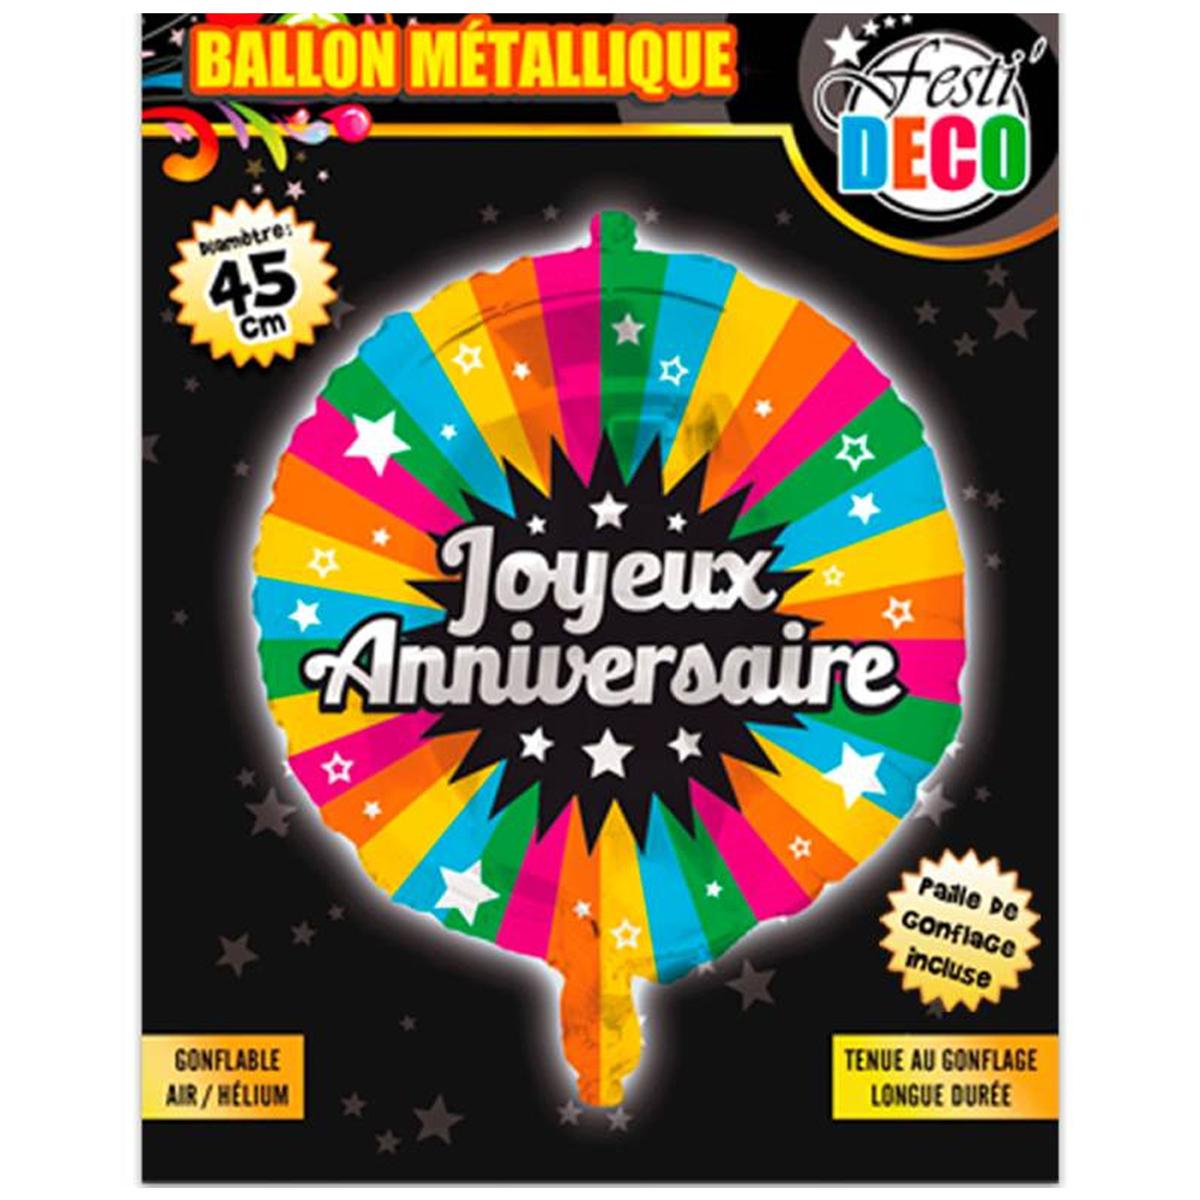 Ballon métallique \'Joyeux Anniversaire\' tutti frutti - 45 cm - [P5357]